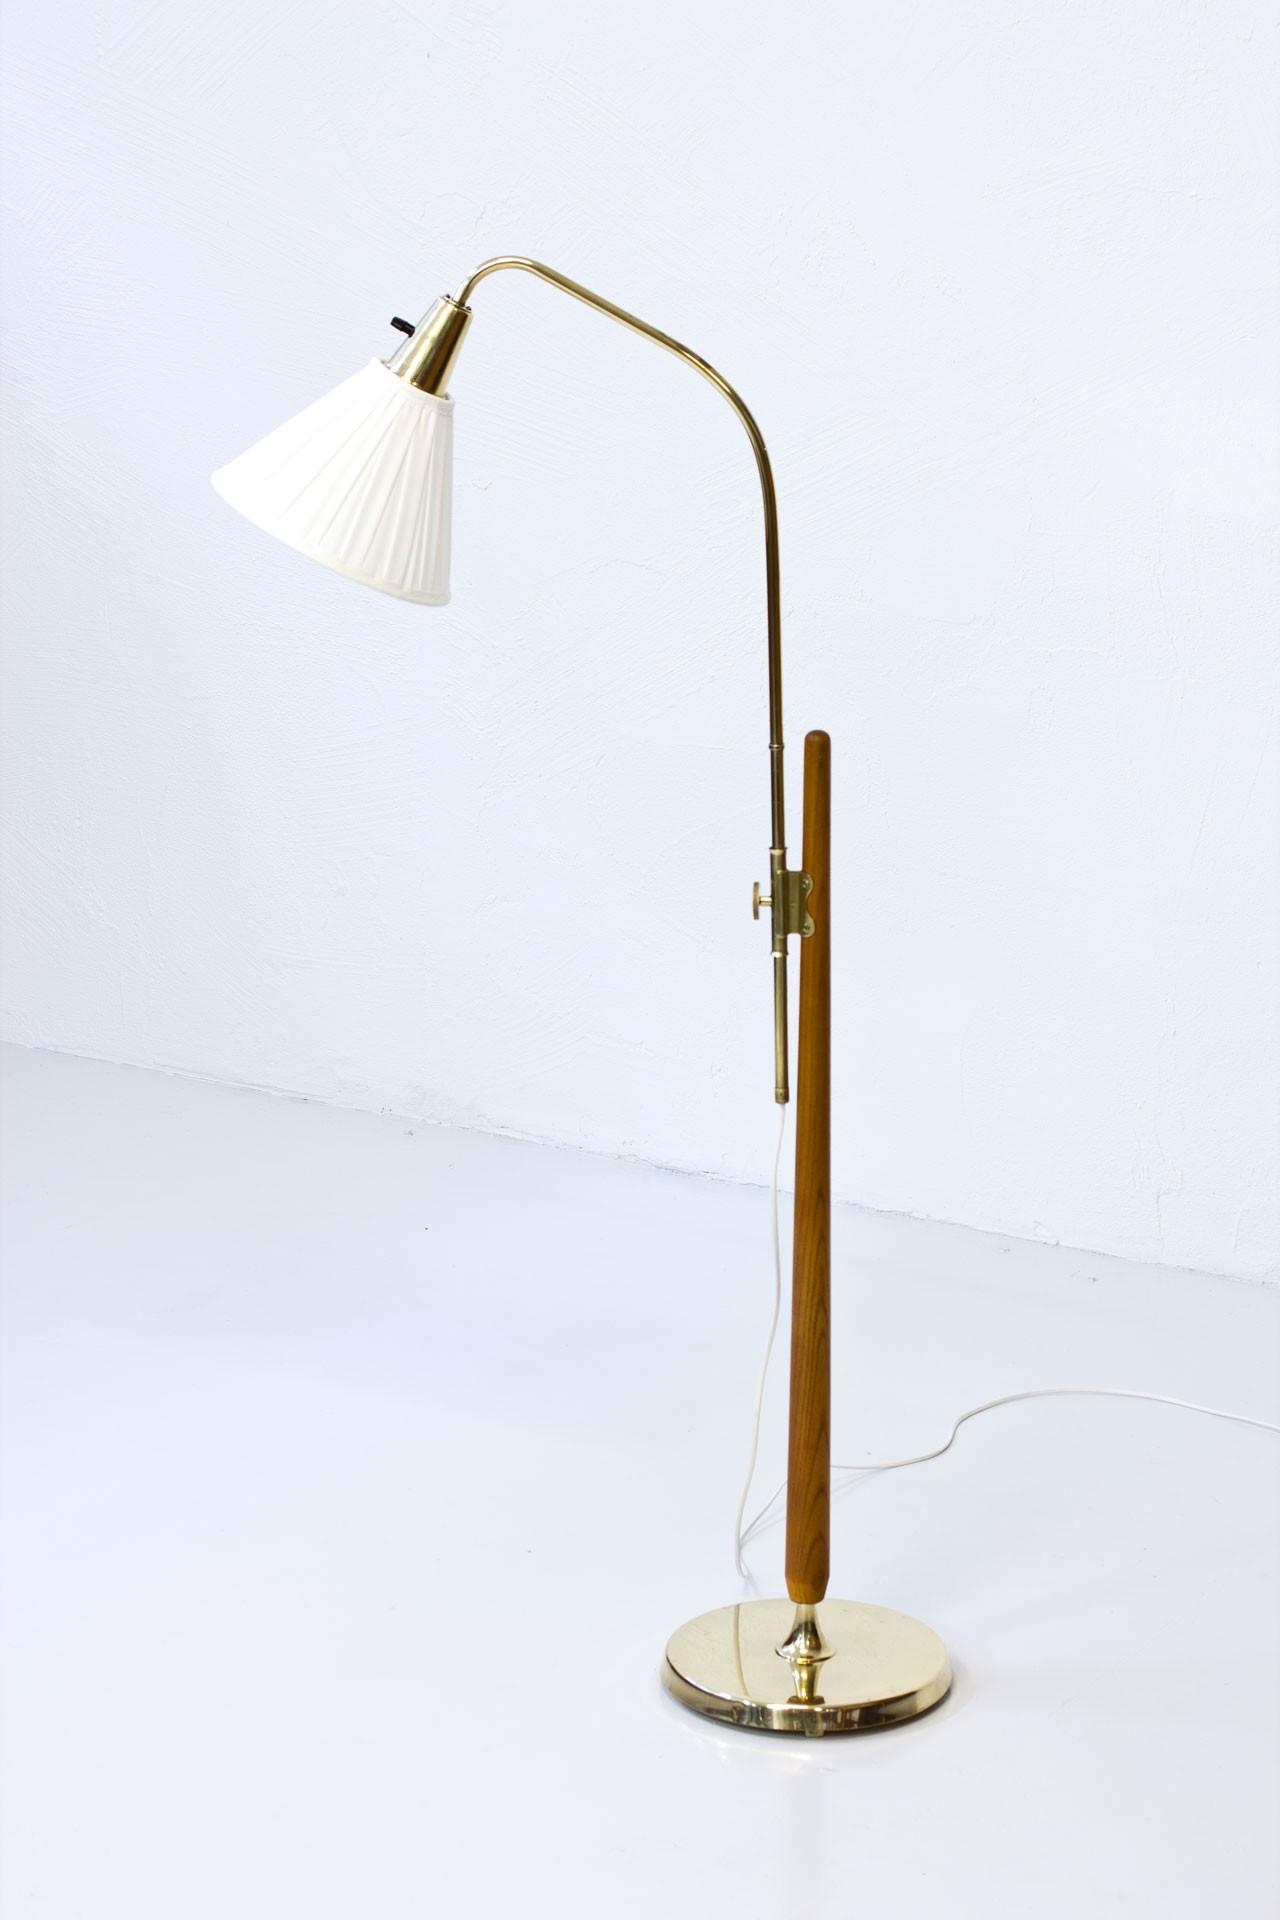 Scandinavian Vintage Floor Lamp By Hans Bergstrm For Asea 1950s Rewiring Antique Lamps Previous Next